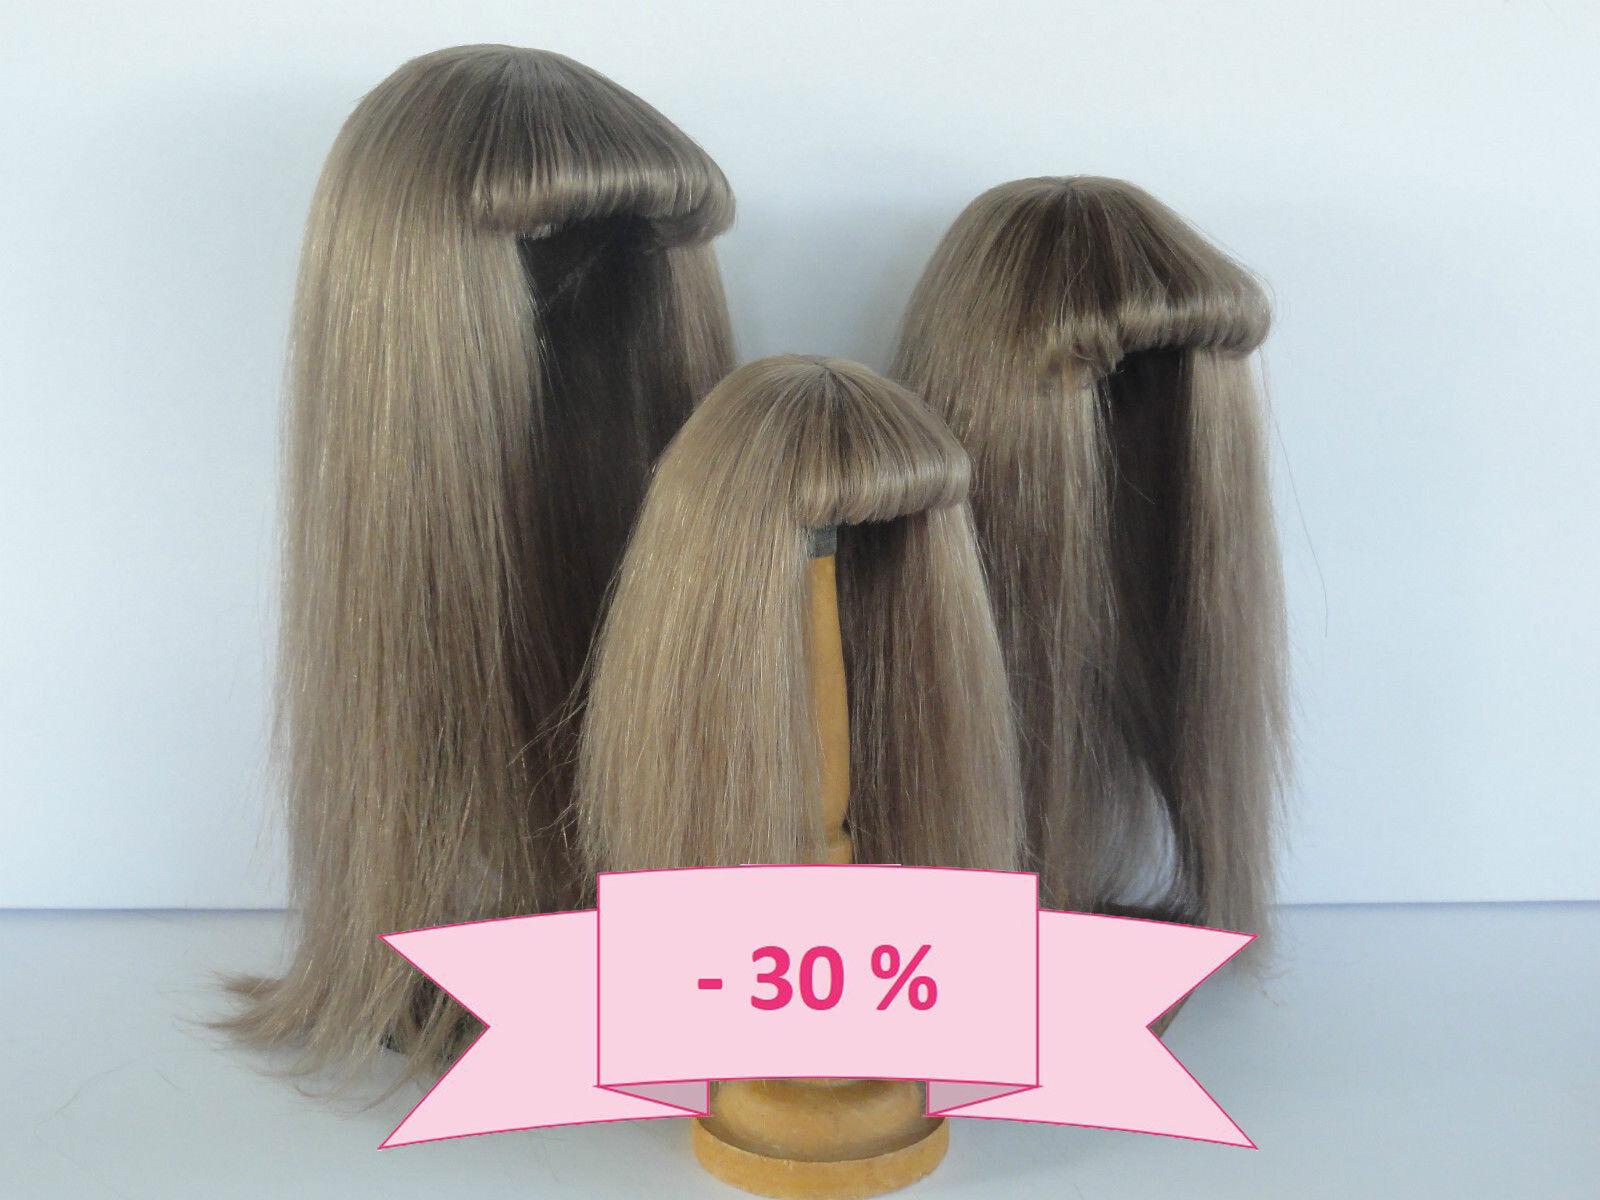 30% Promo  Parrucca per Bambola T14 43cm 100% Capelli Naturali  G.Bravot